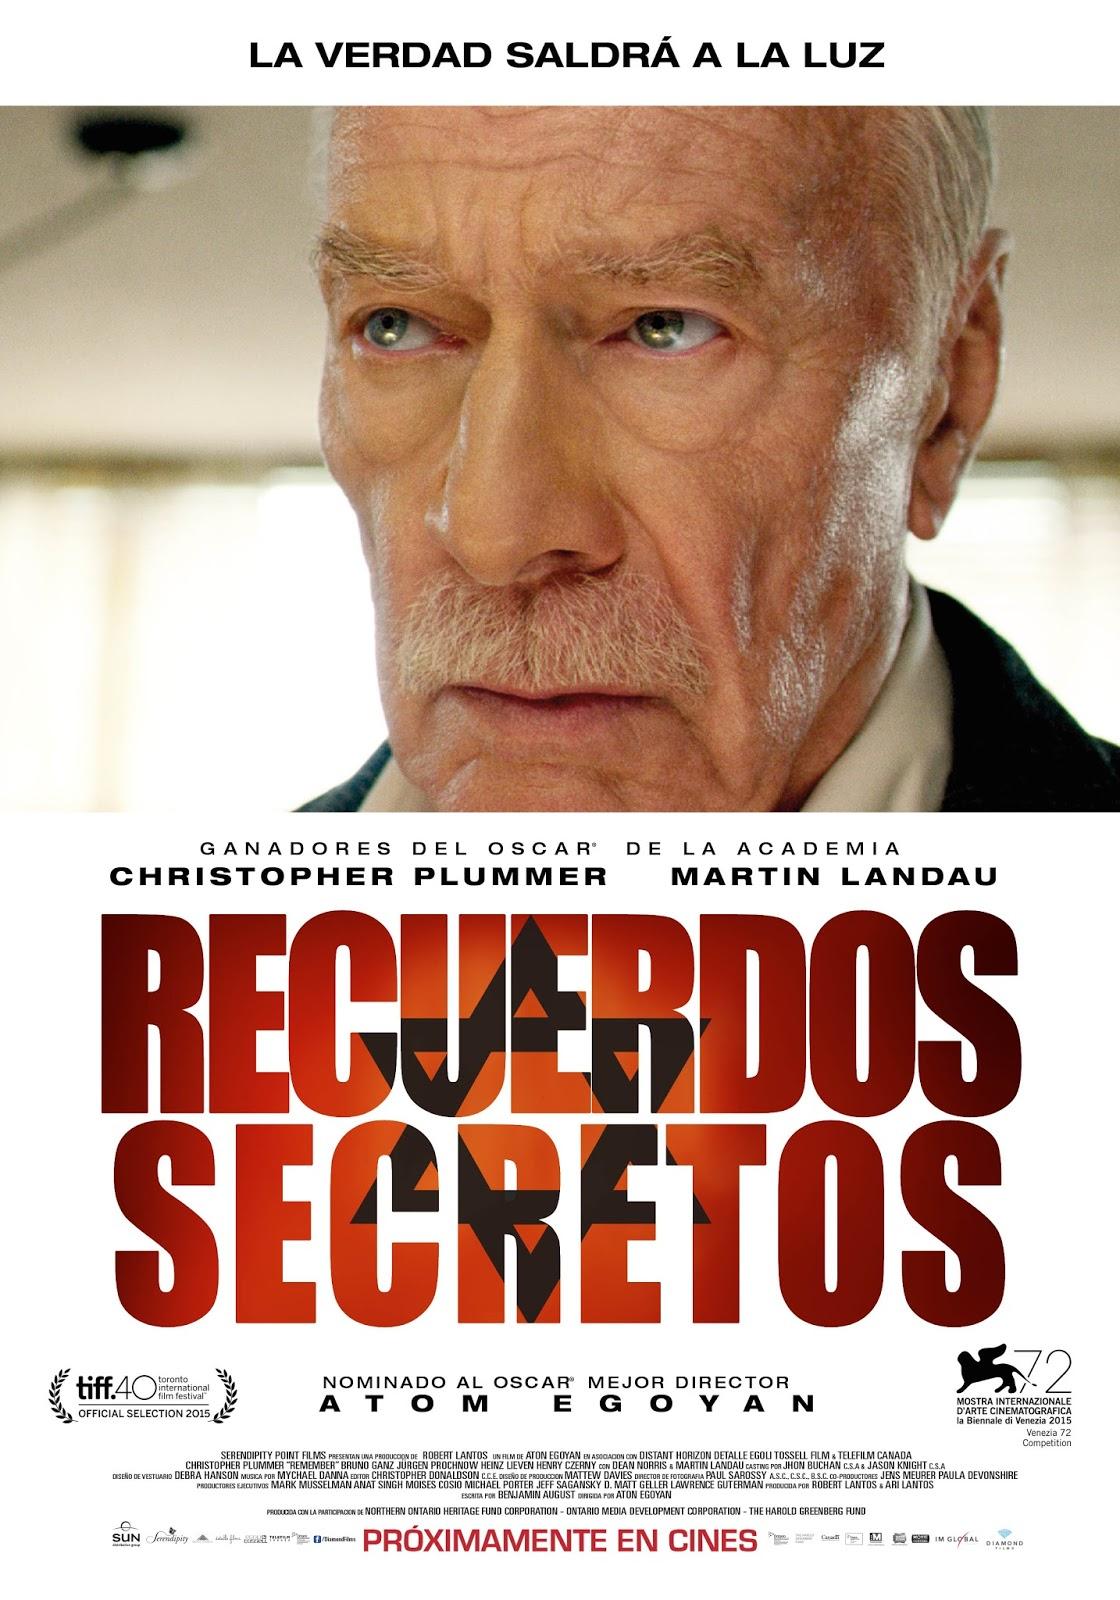 Photo of Recuerdos Secretos